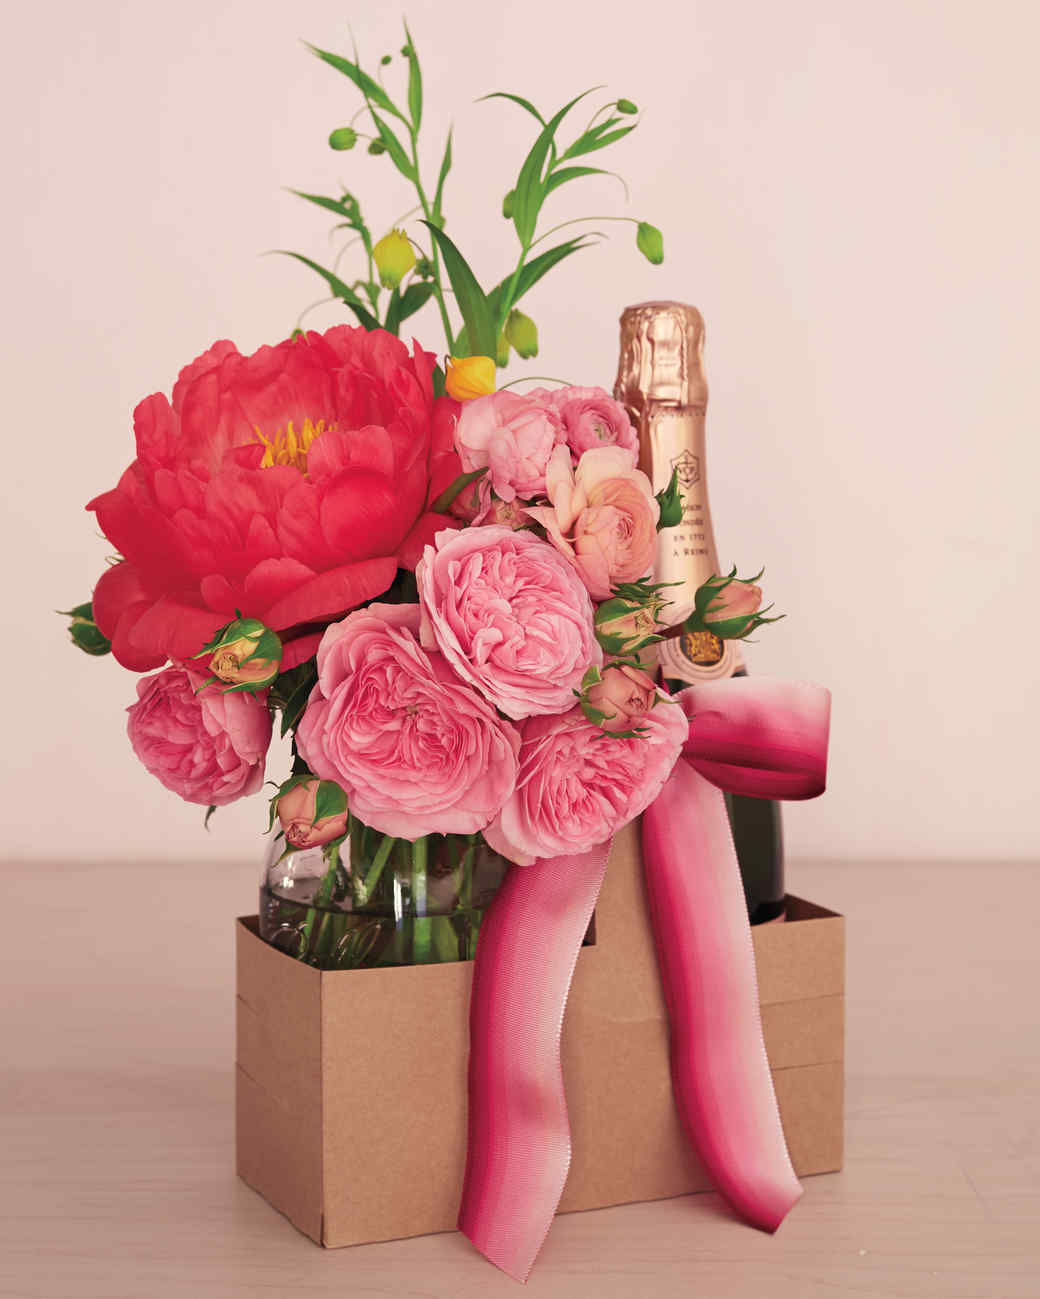 crafts-champagneflowers-027-r-mld110777.jpg